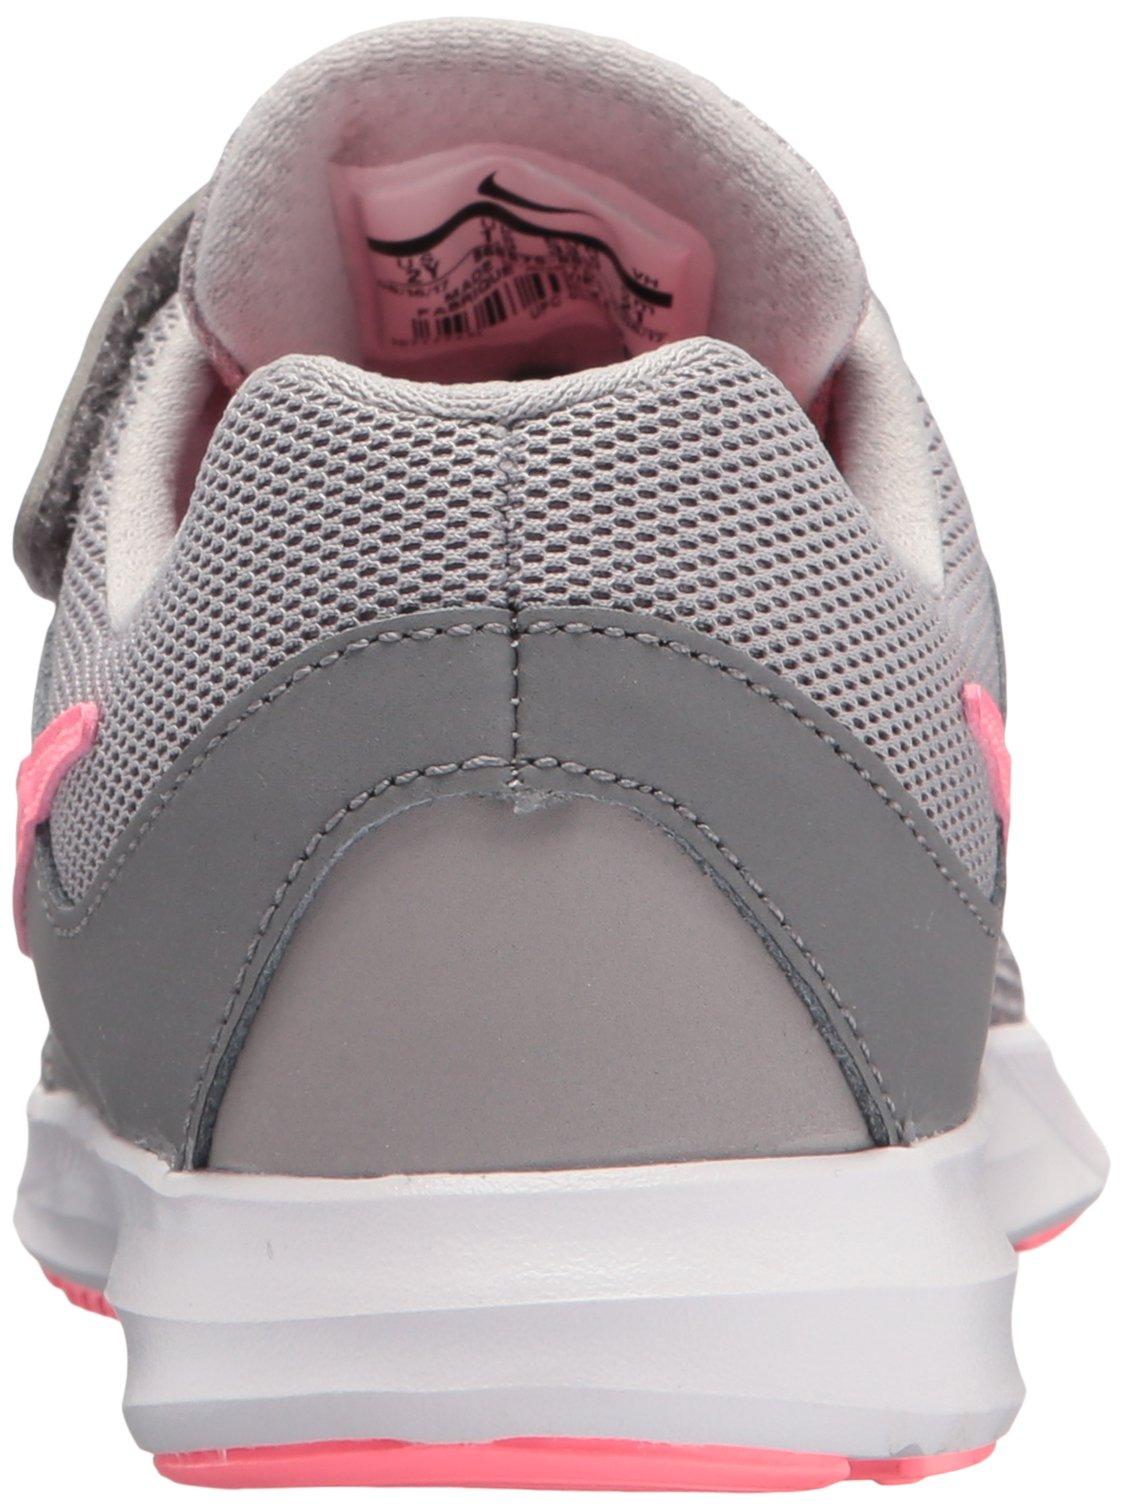 Nike Girls' Downshifter 7 (PSV) Running Shoe, Gunsmoke/Sunset Pulse-Atmosphere Grey, 2 M US Little Kid by Nike (Image #2)